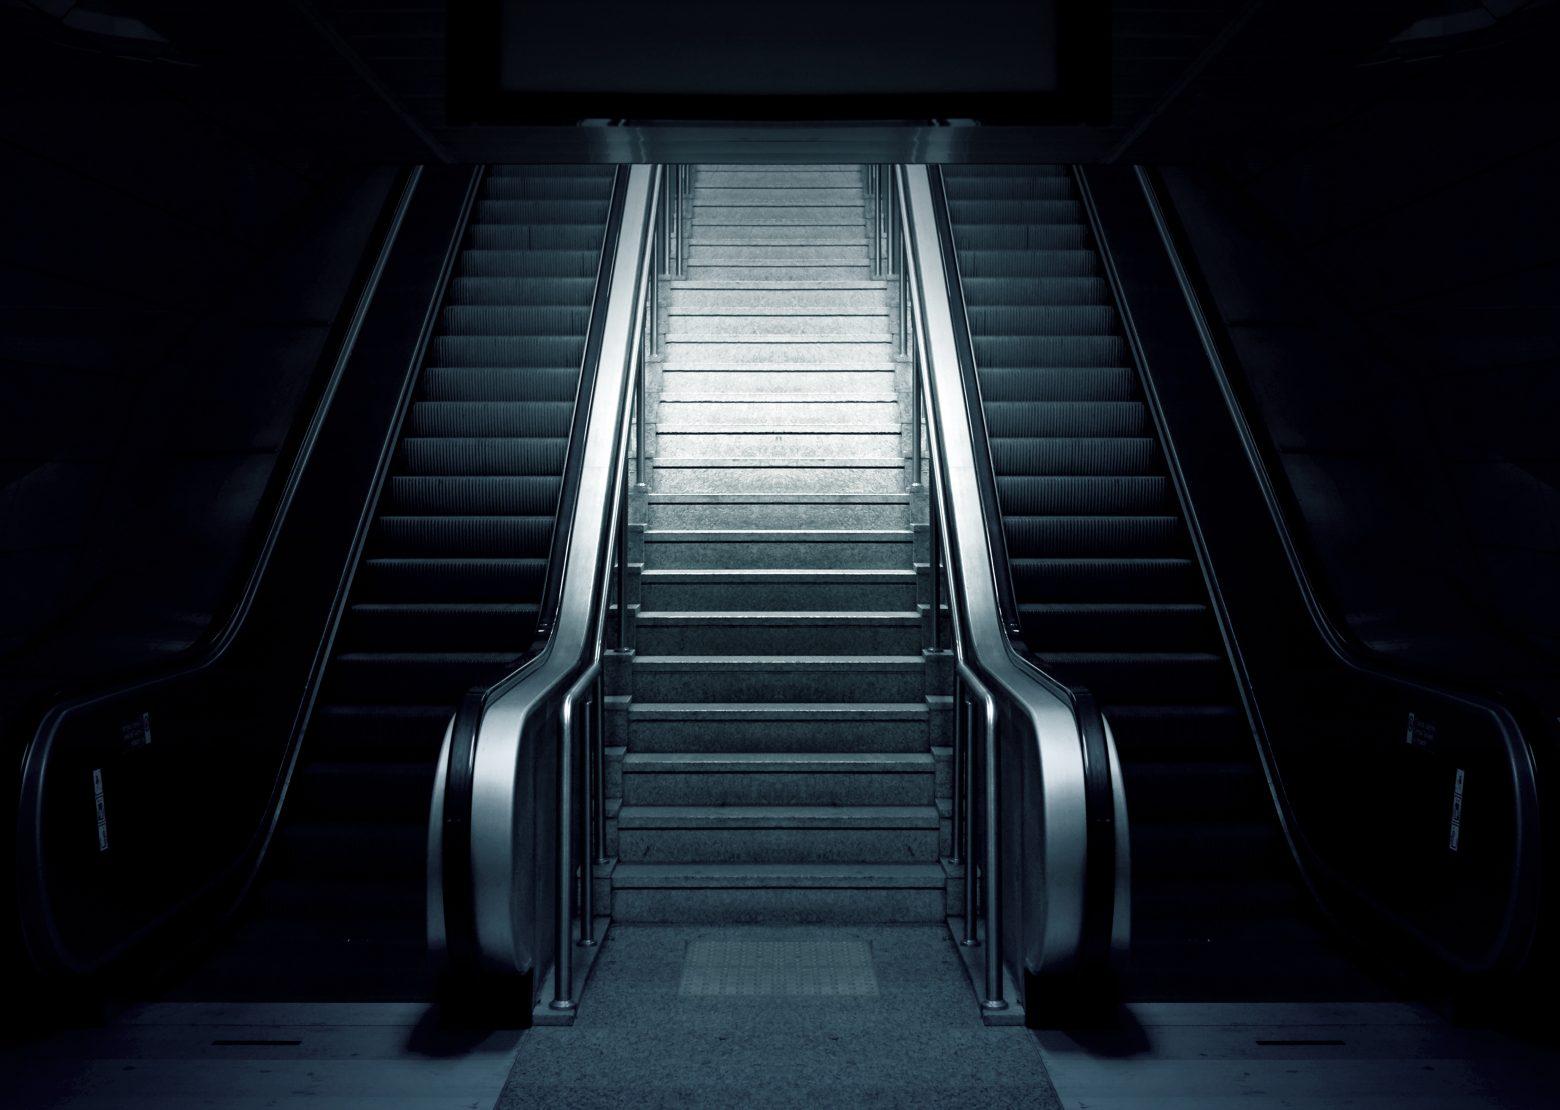 escalator-769790